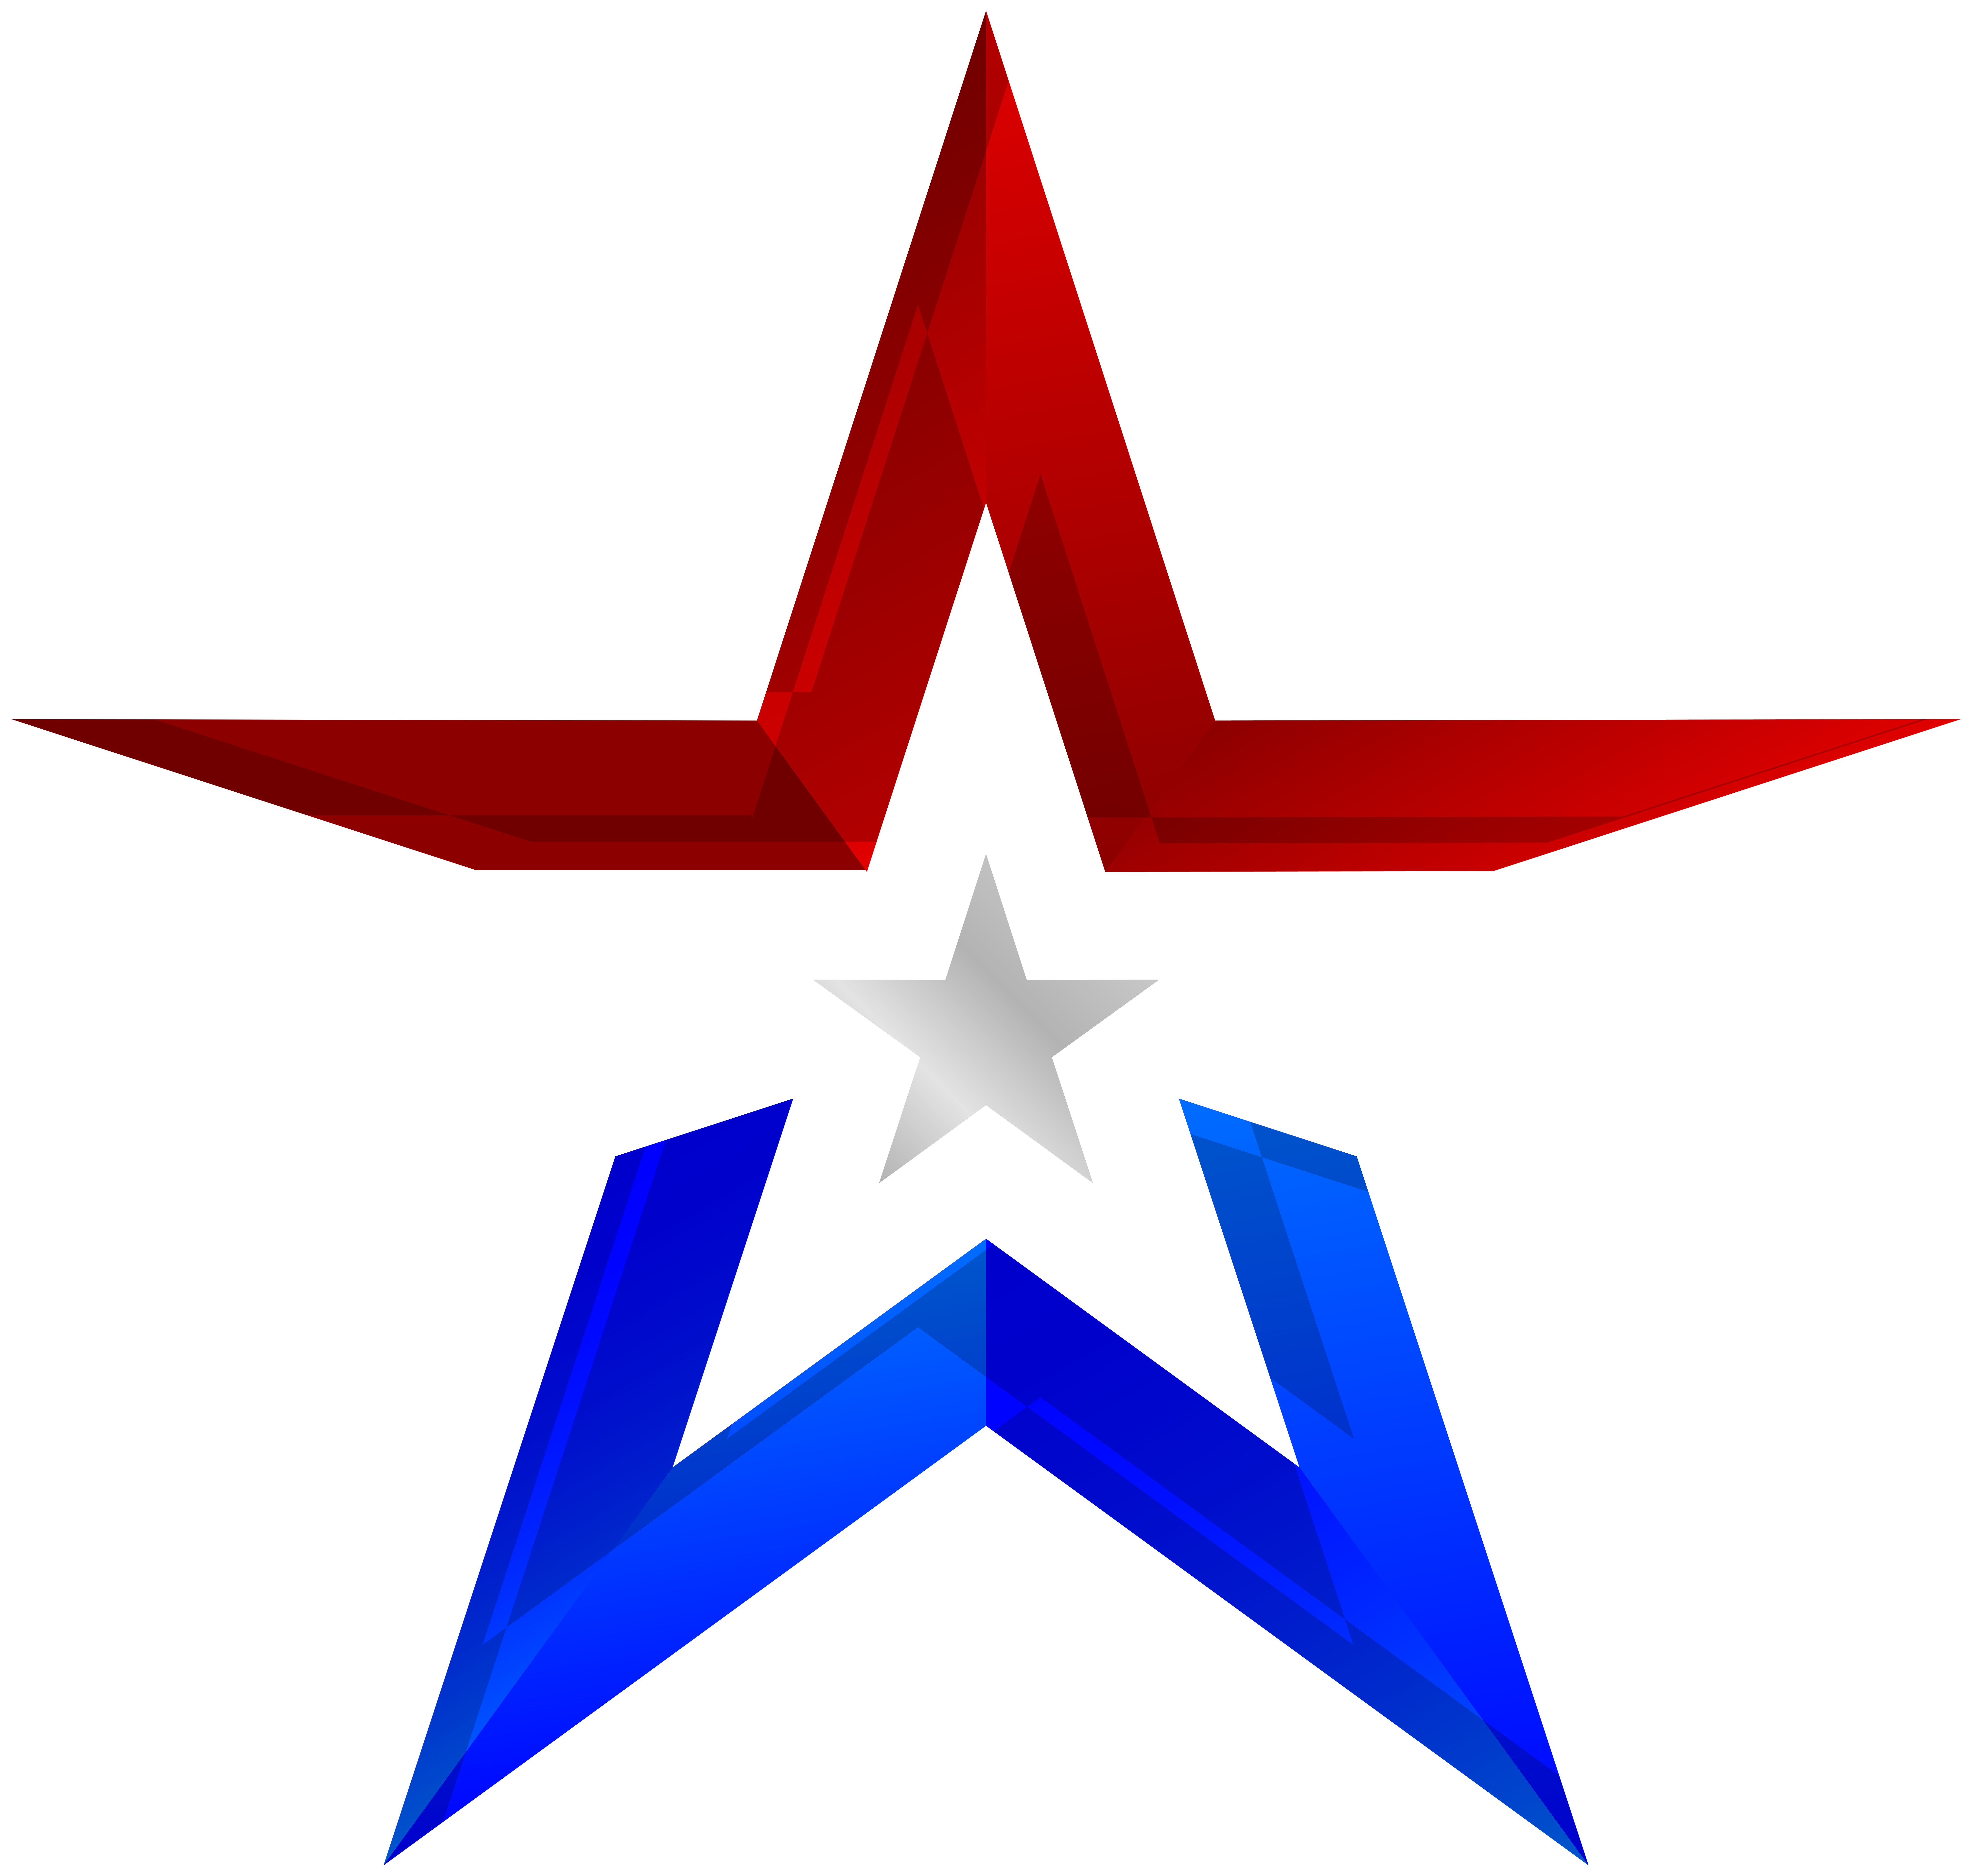 USA Colors Star Transparent PNG Clip Art Image.